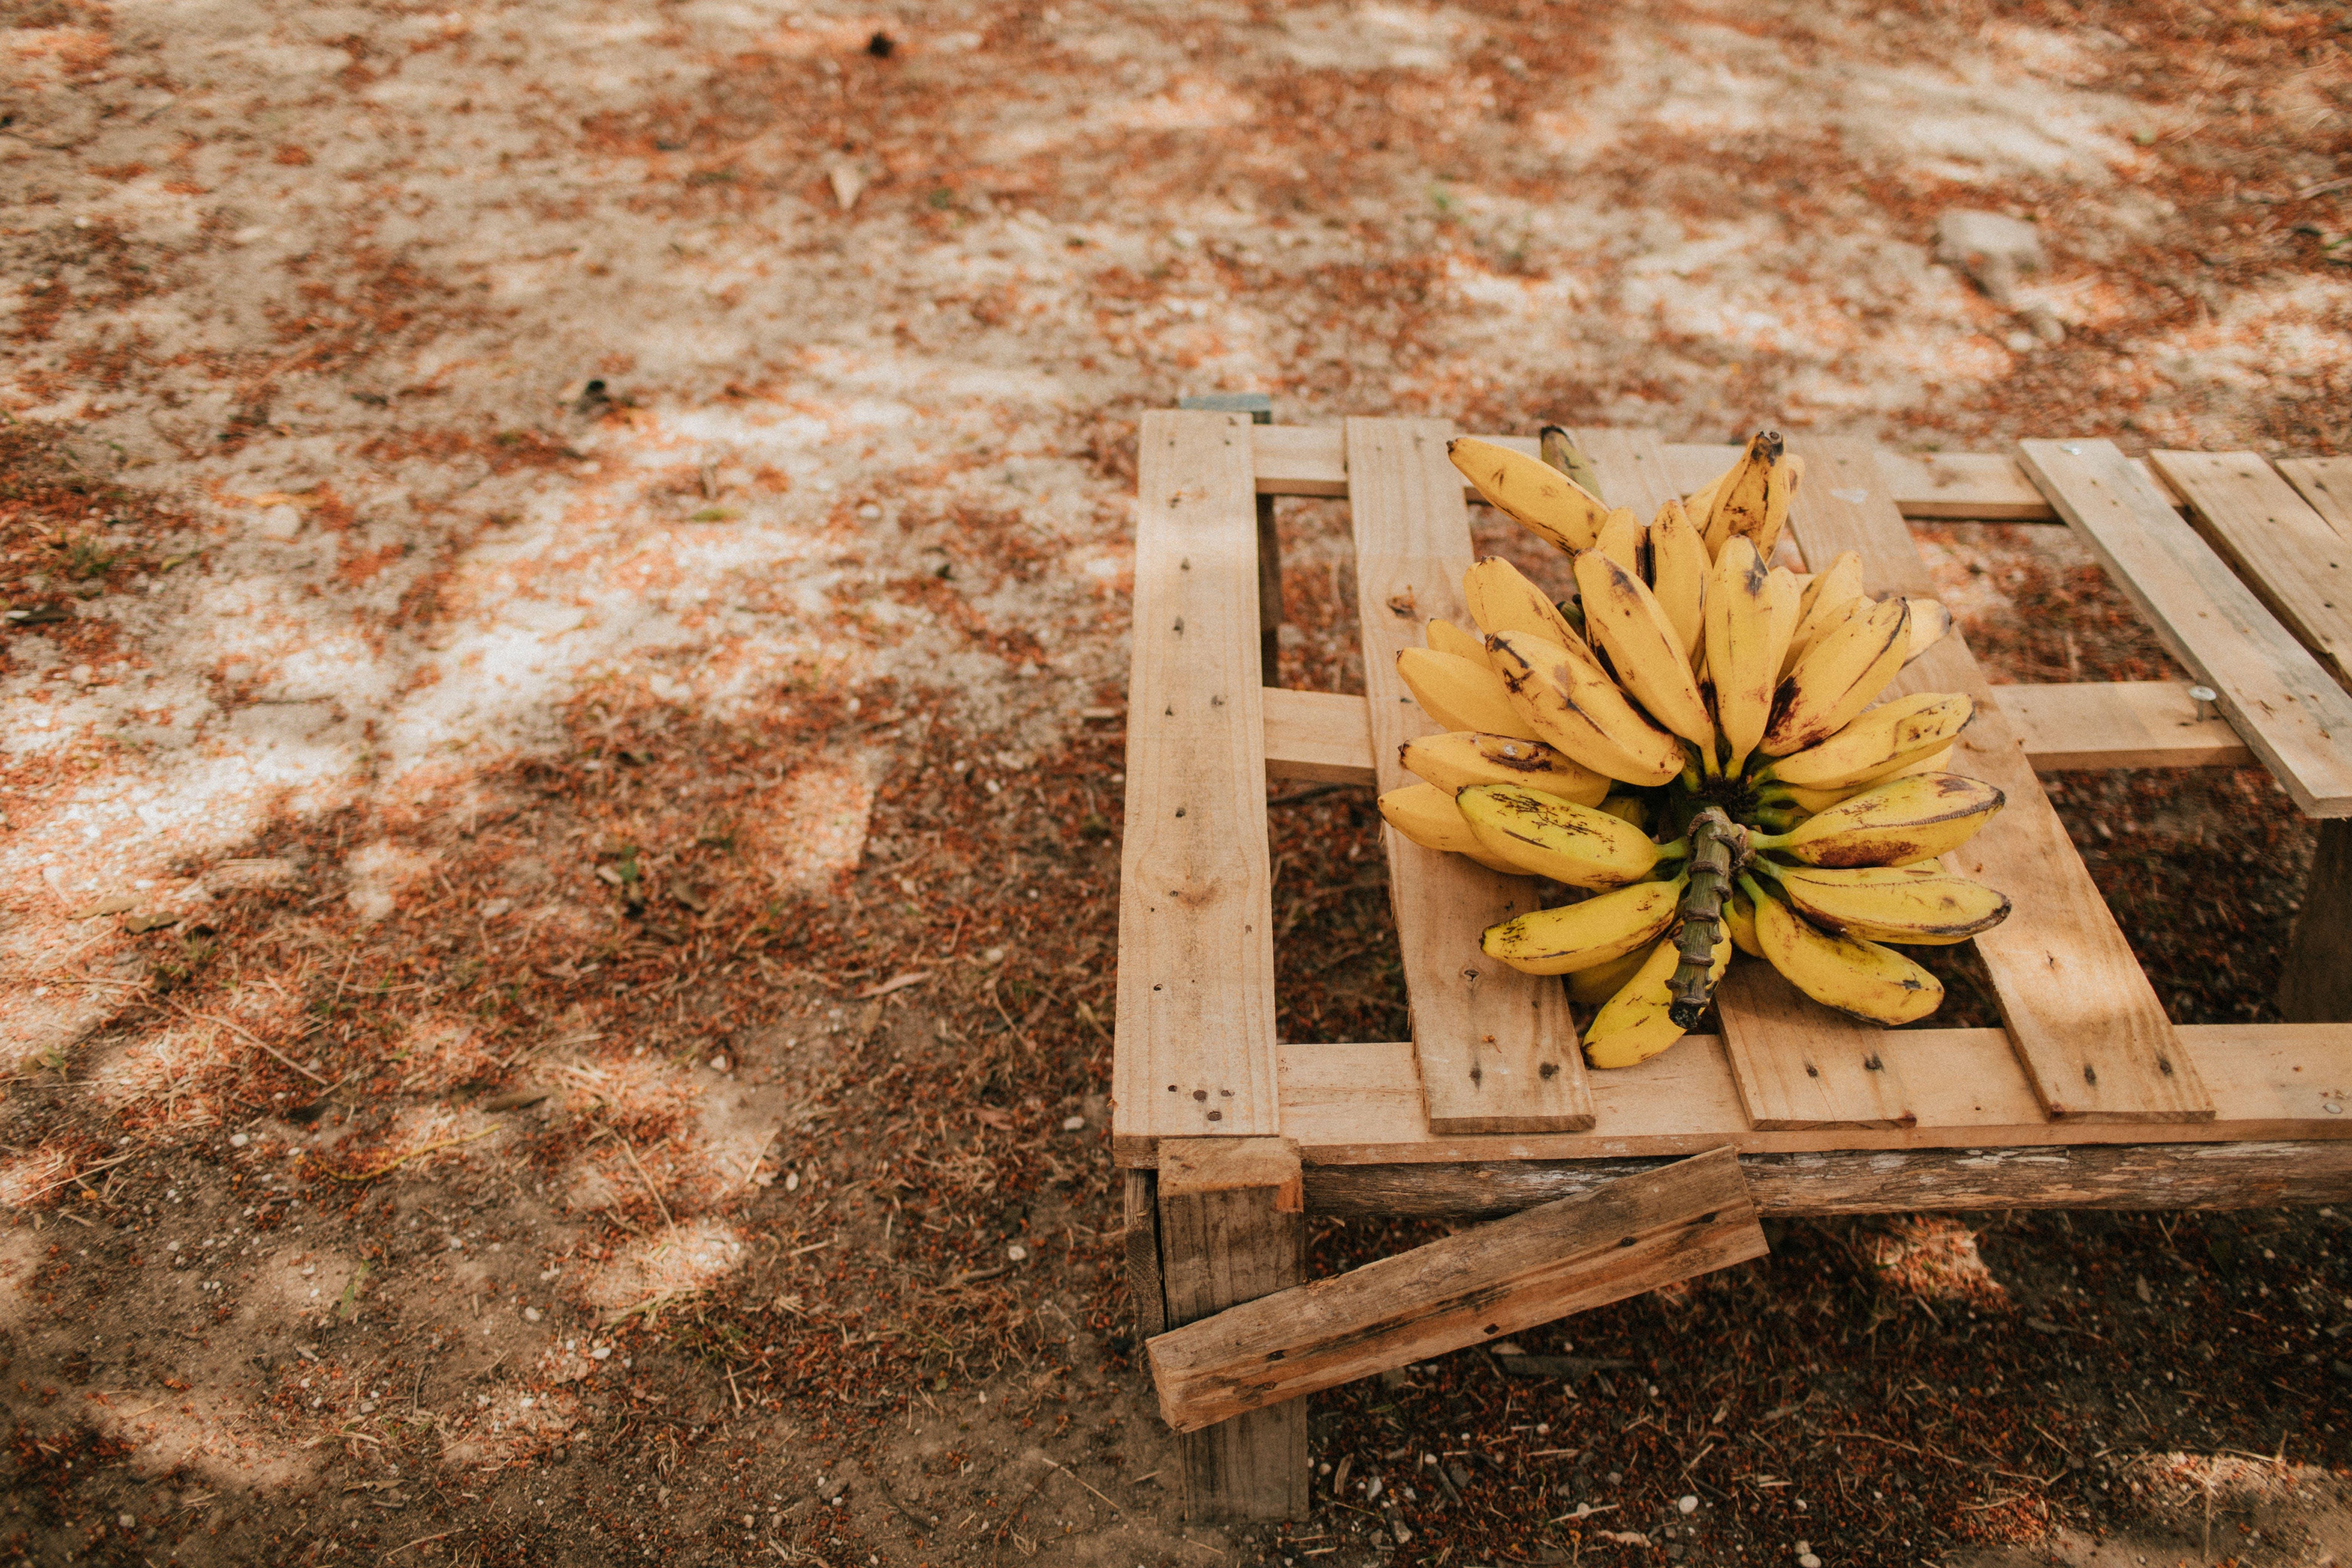 Bundle Of Ripe Banana